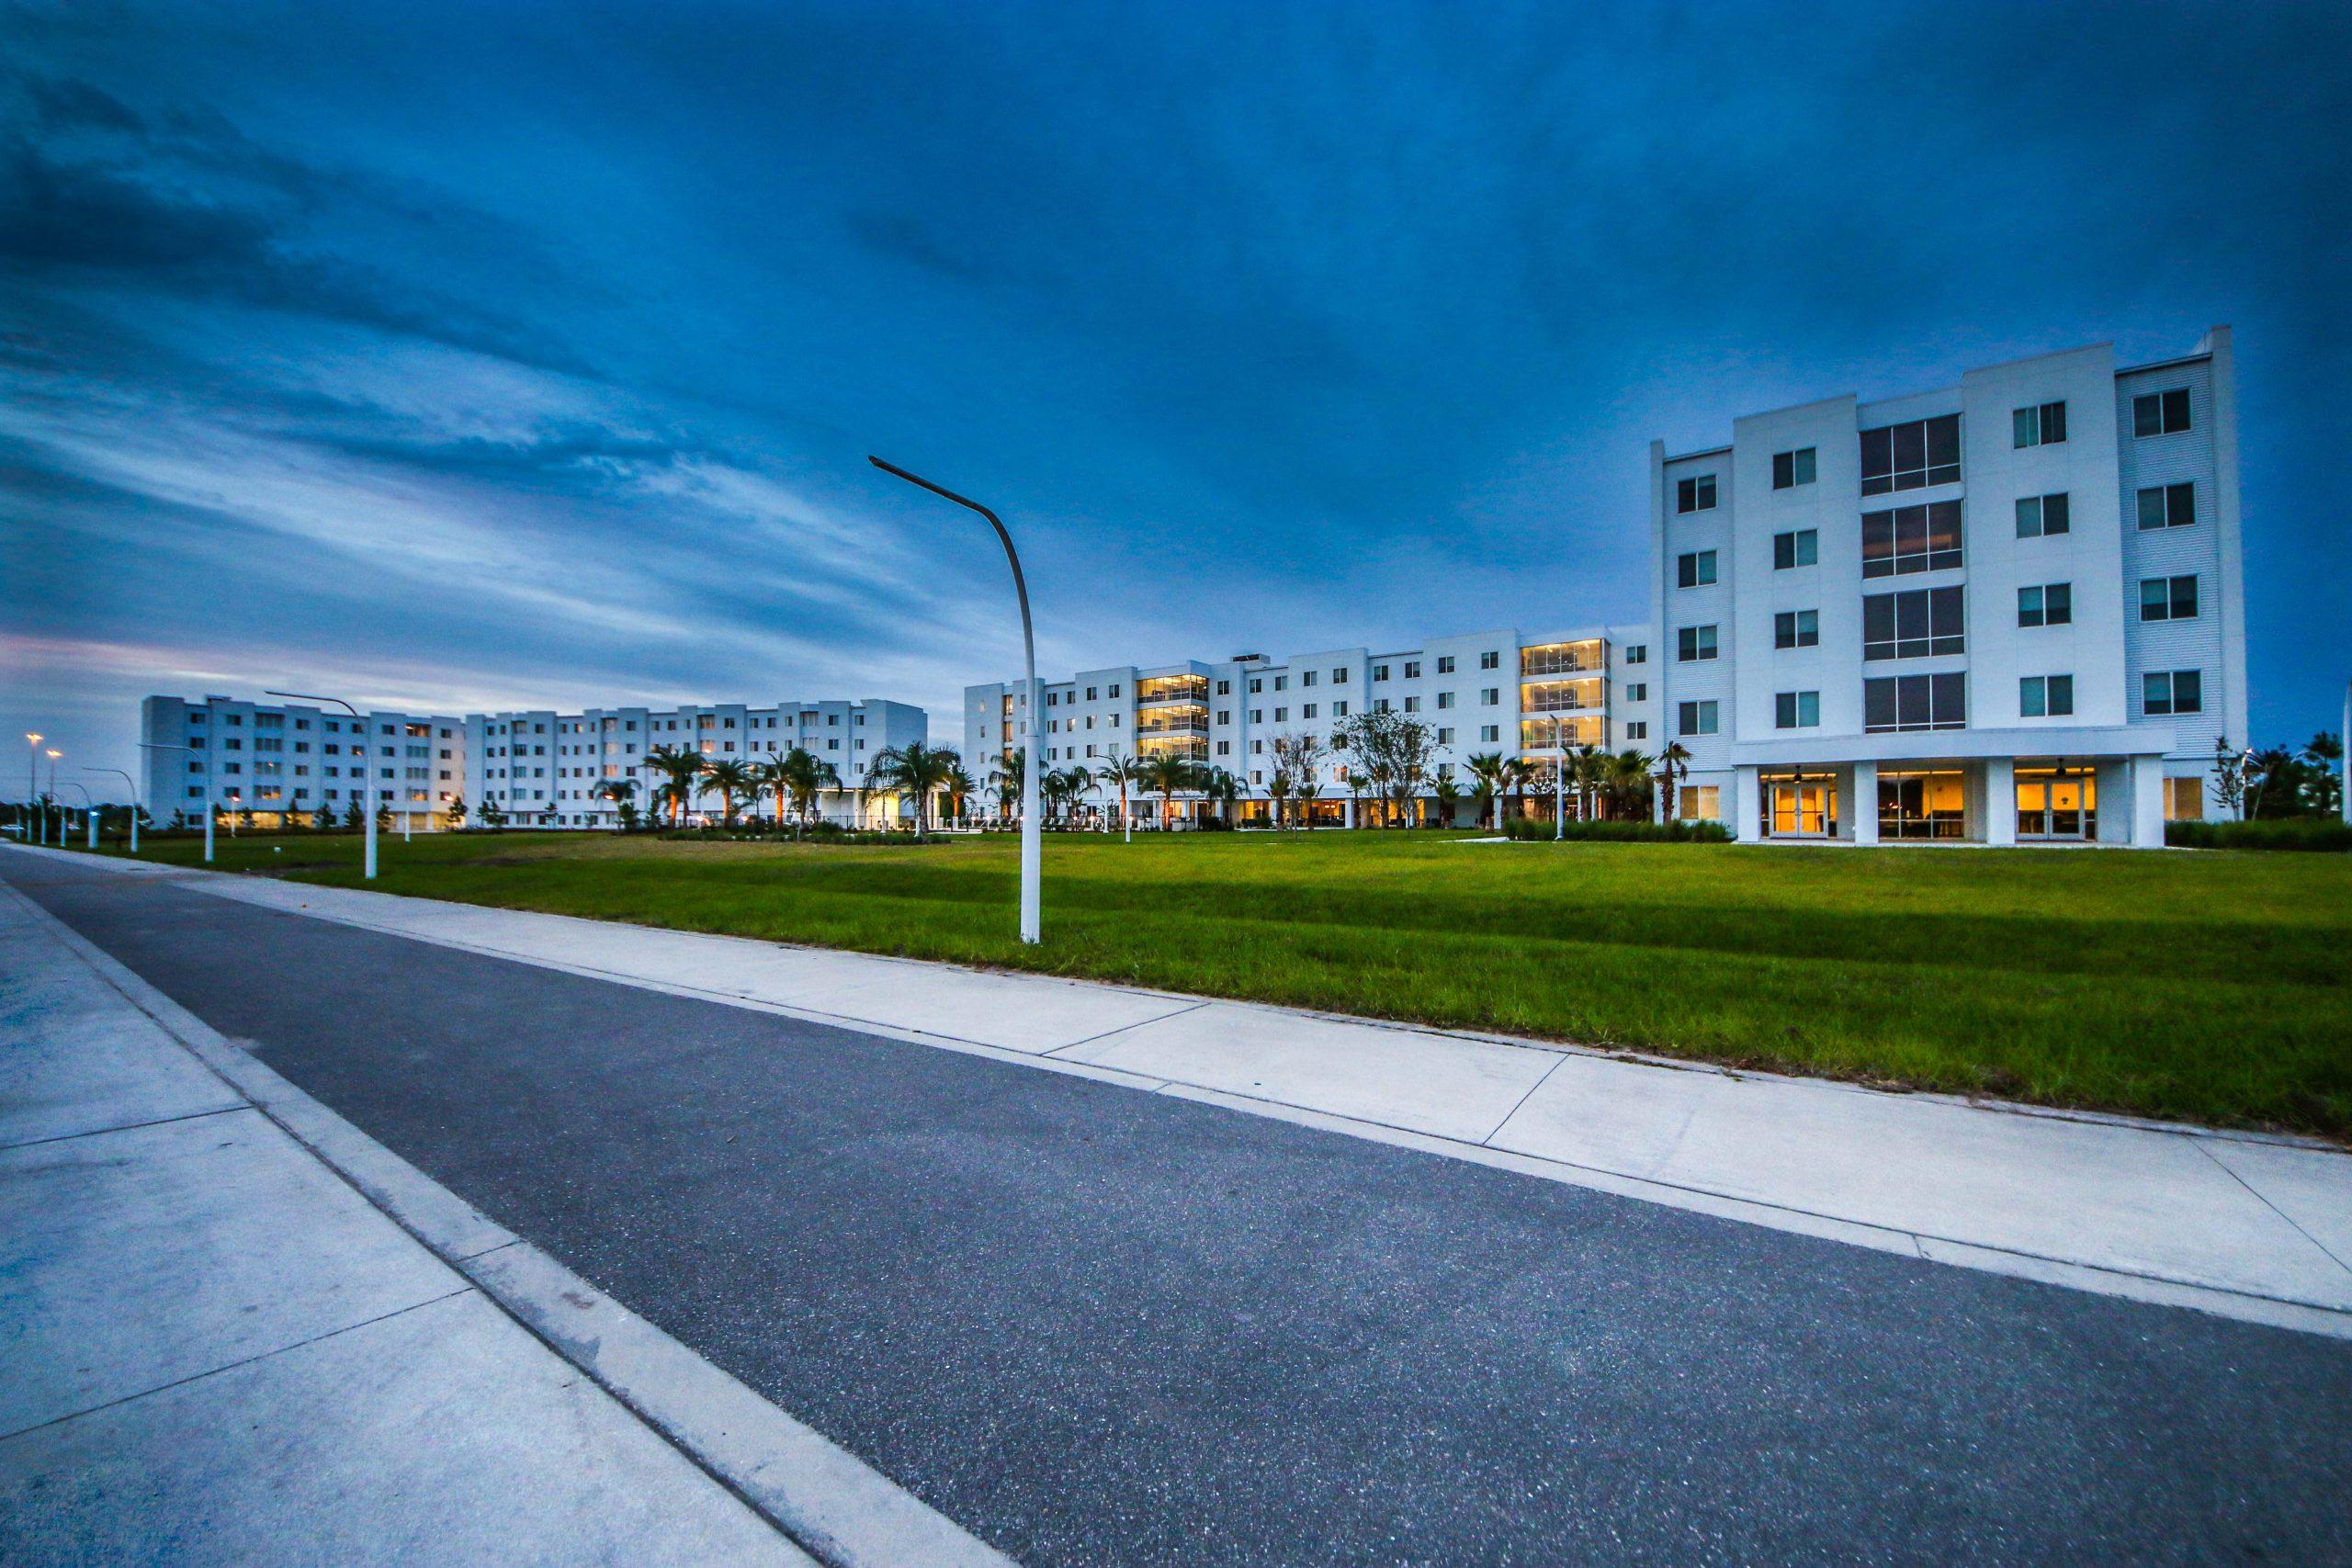 Multi story student housing development in evening